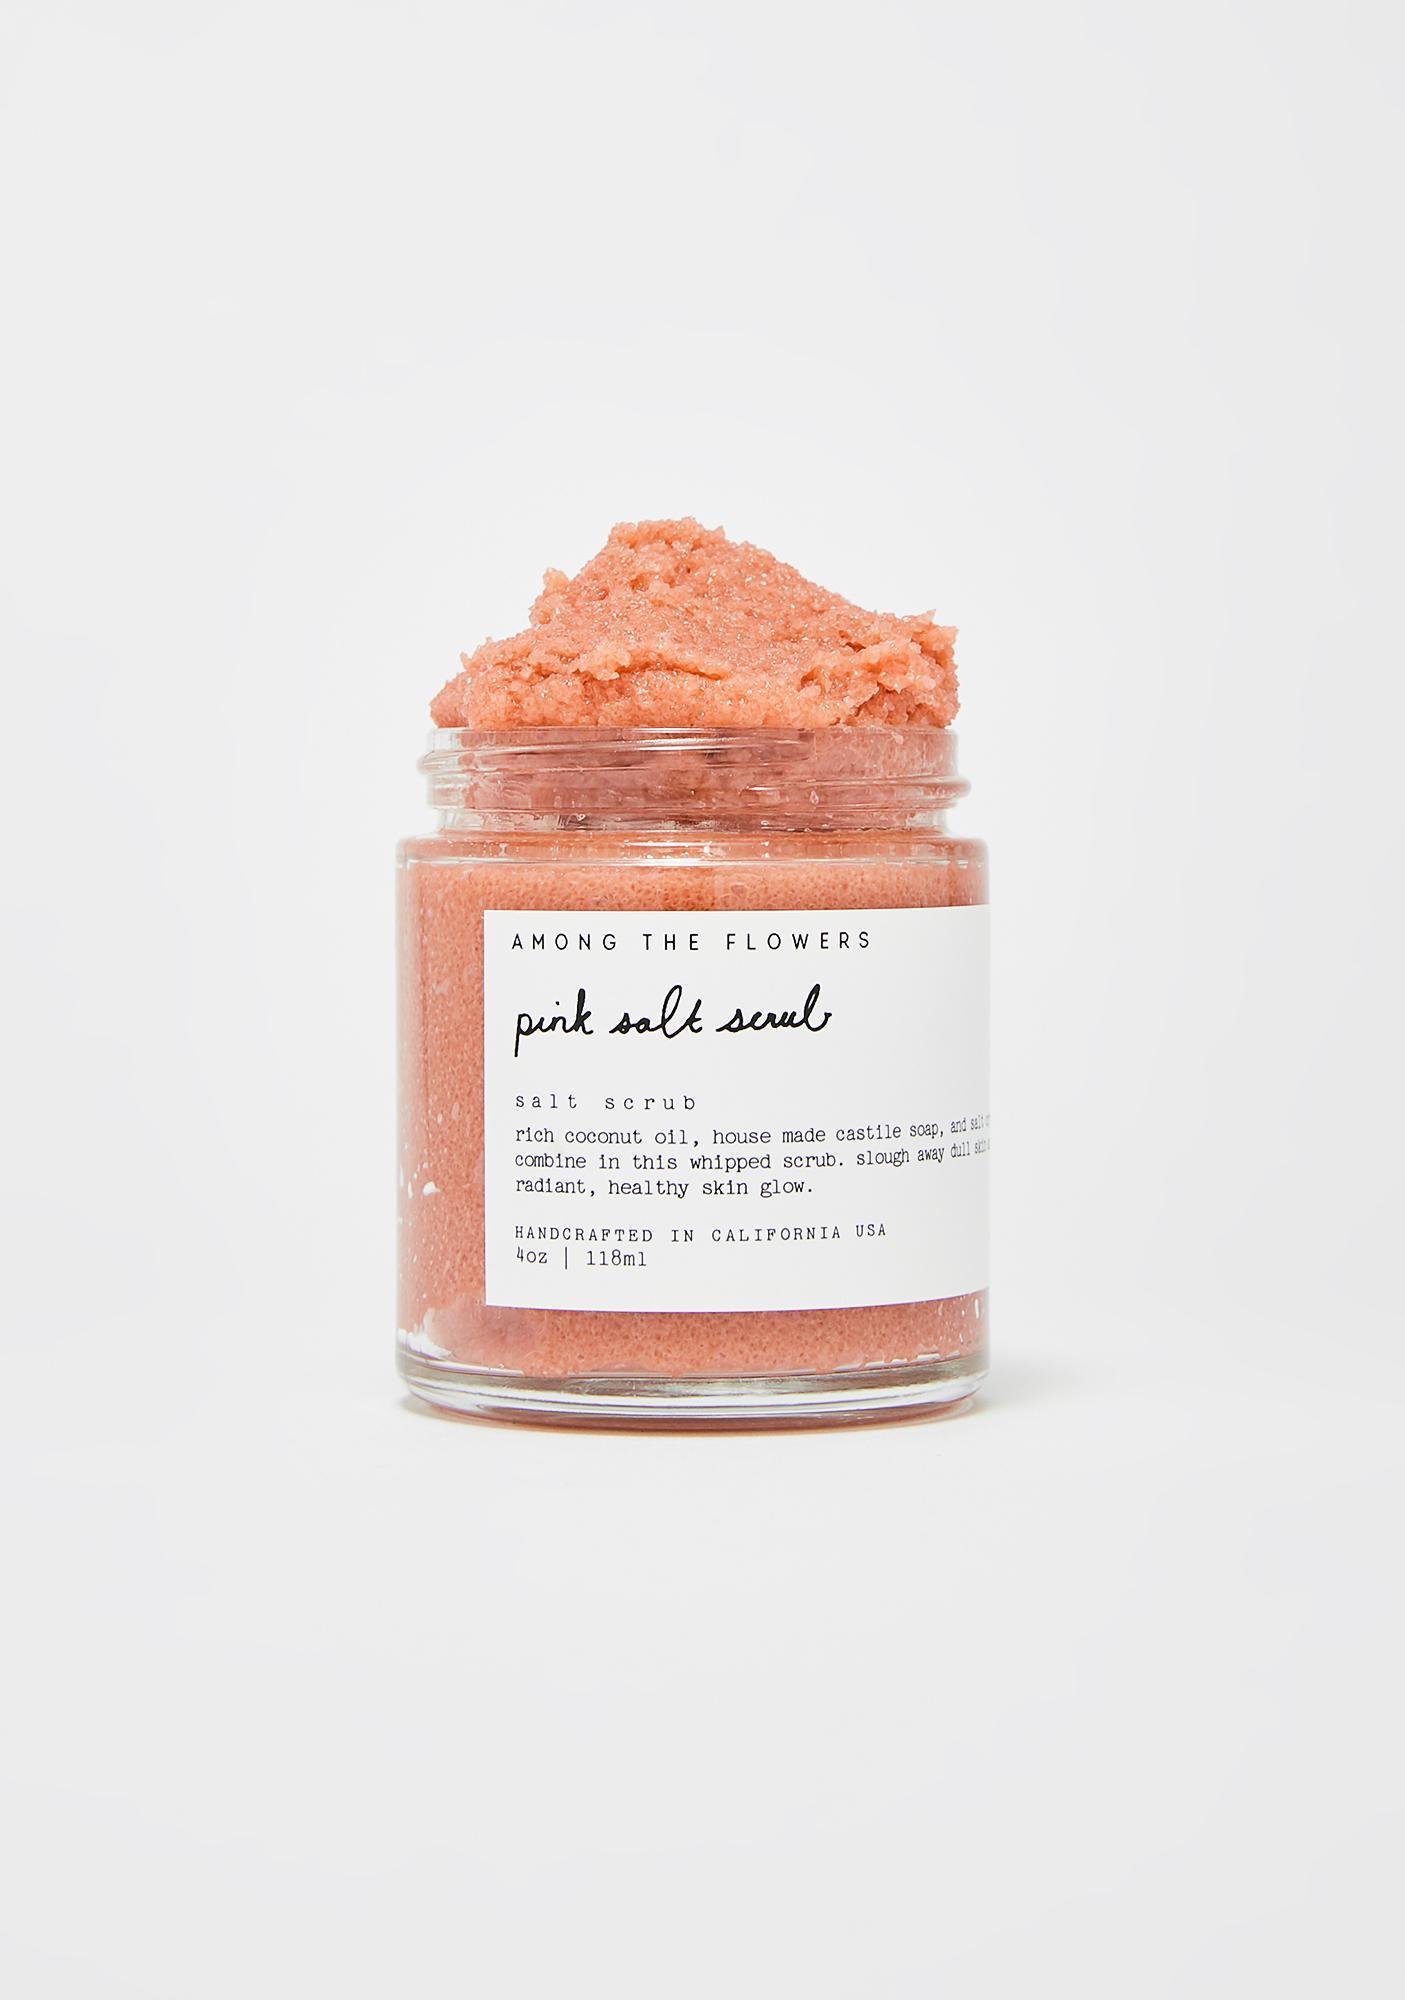 Among The Flowers Pink Salt Scrub